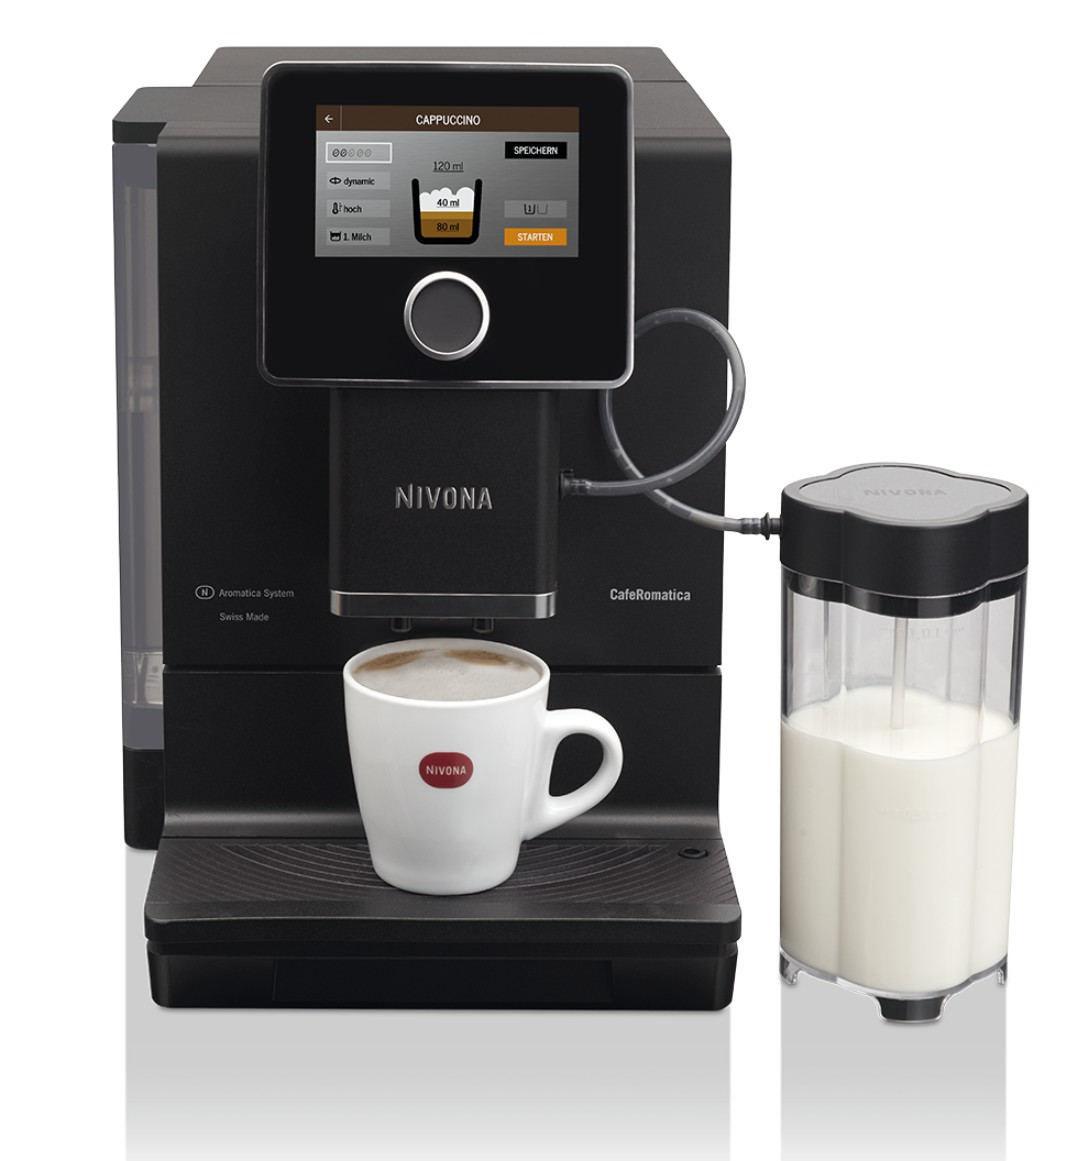 Nivona CafeRomatica 960 Mattschwarz - Chrom NICR960